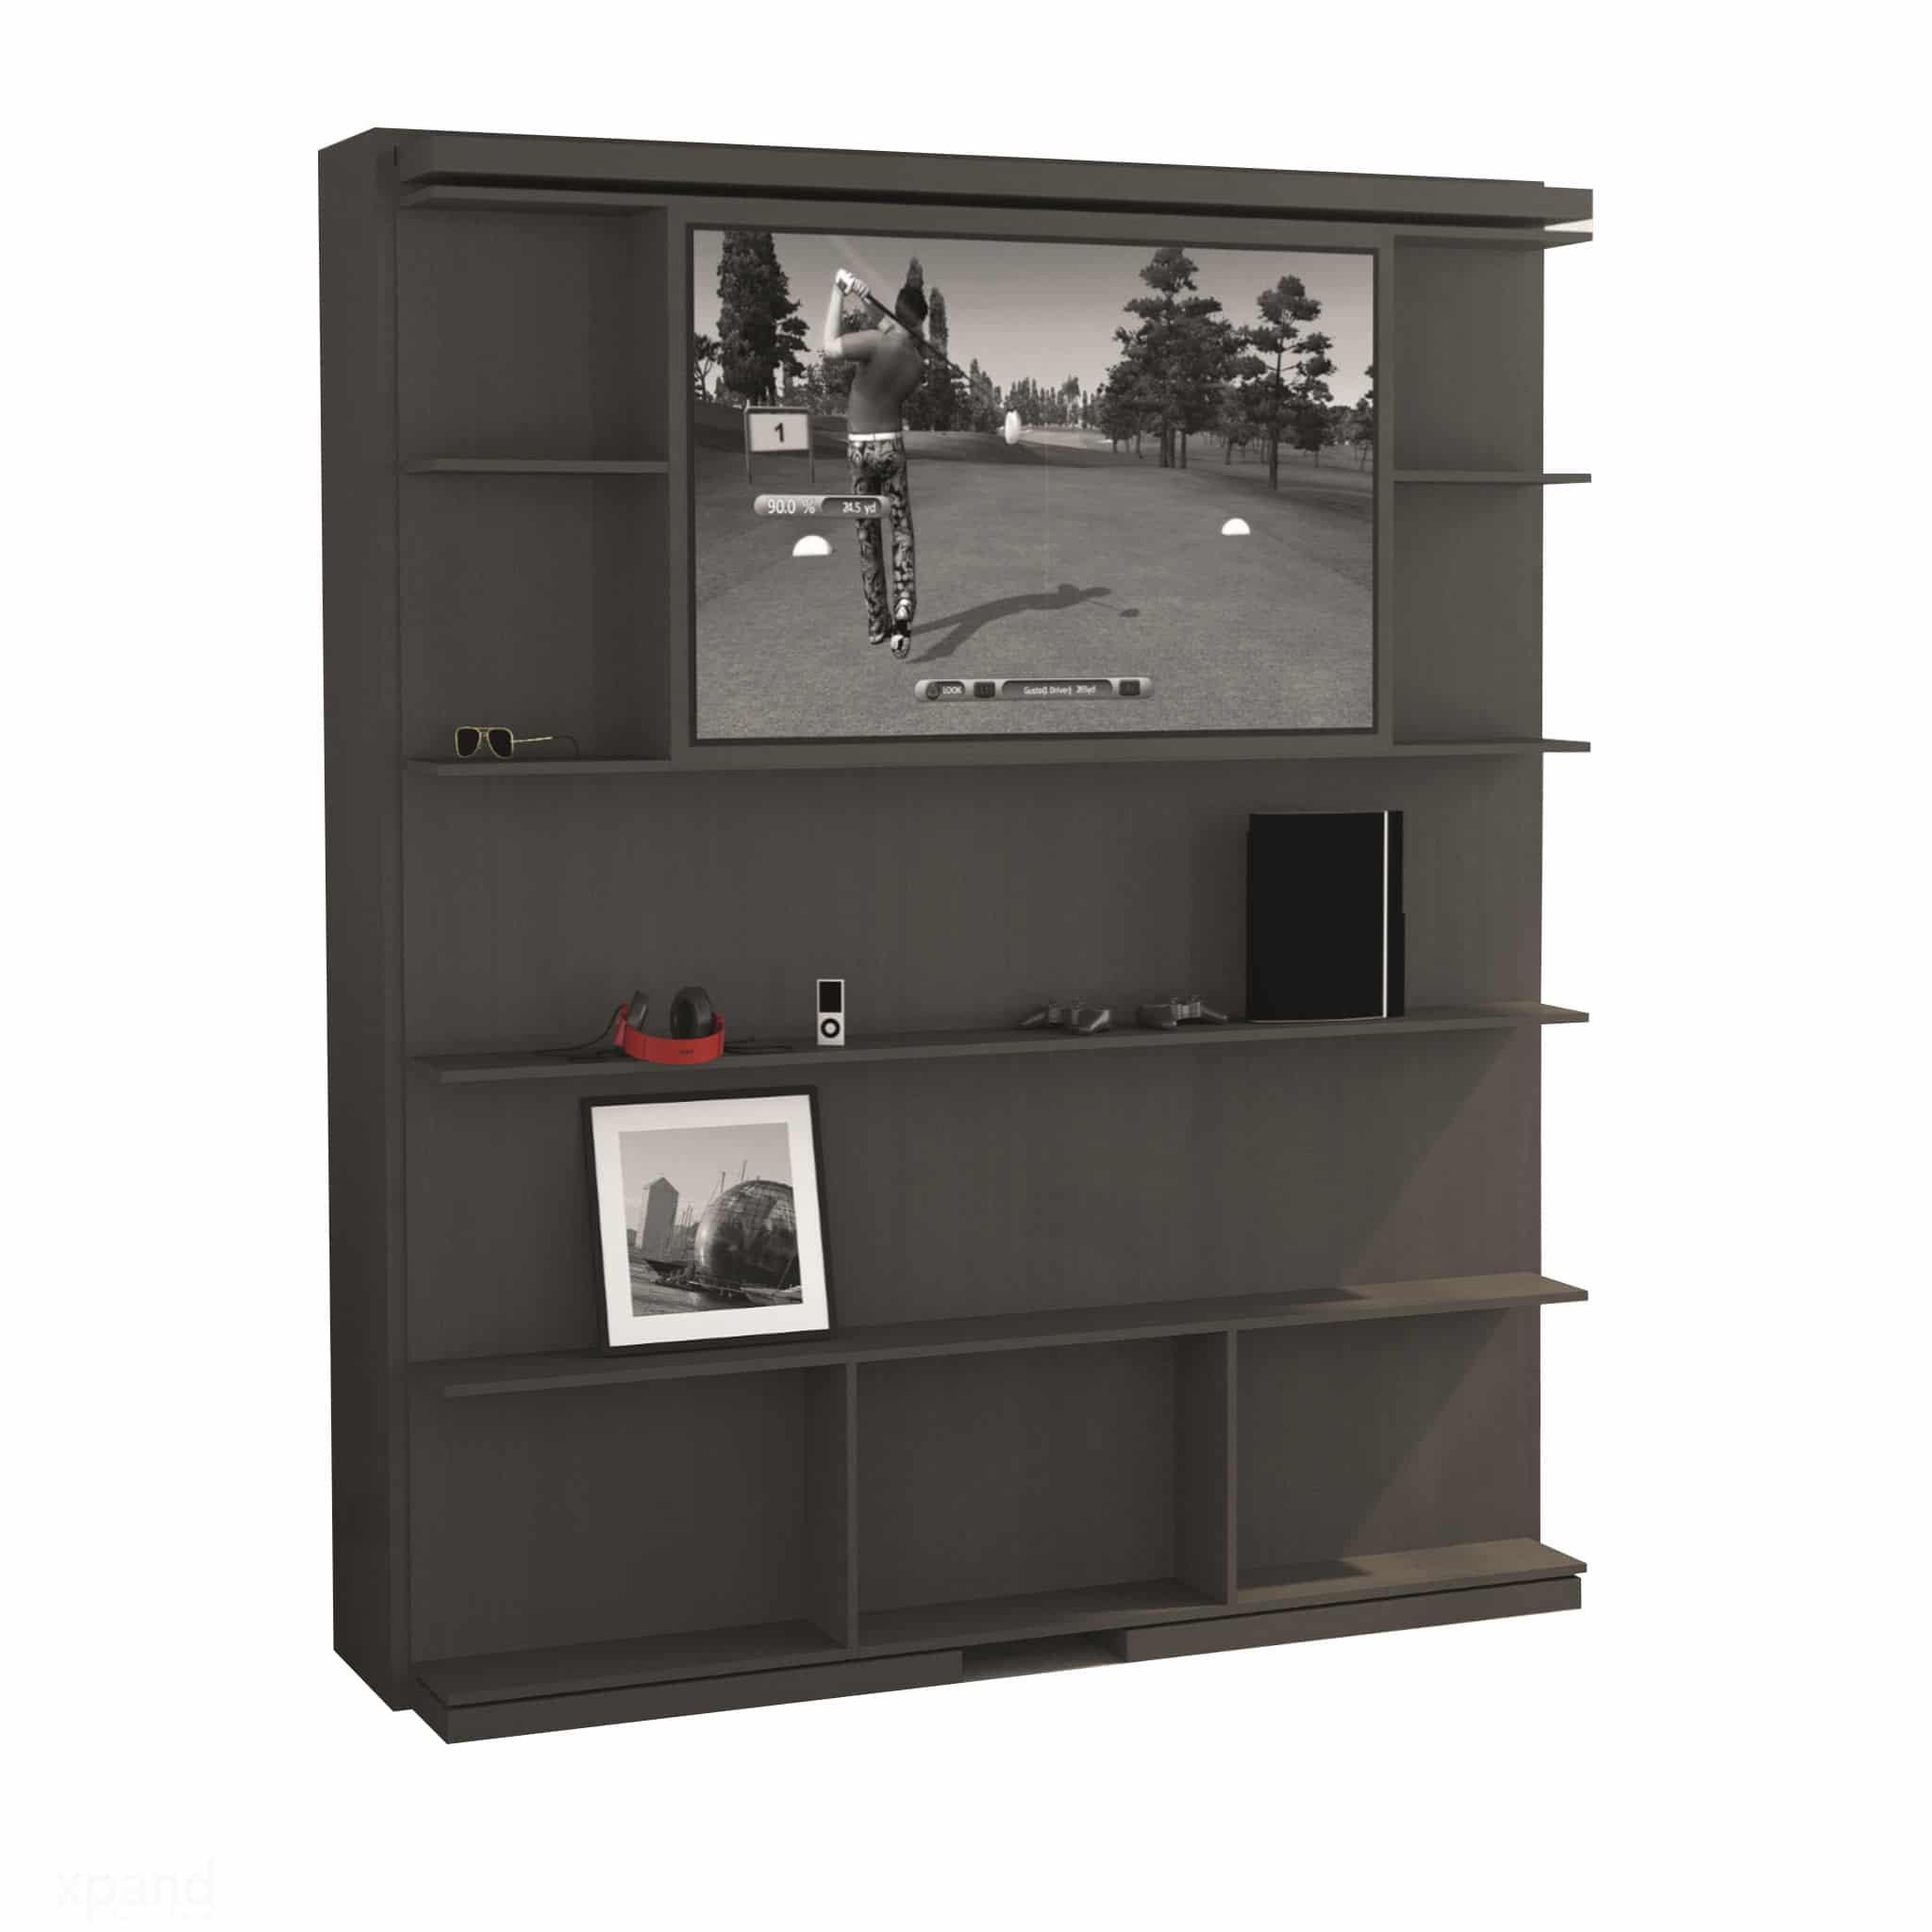 Compatto Tv Revolving Bookshelf Tv Murphy Bed